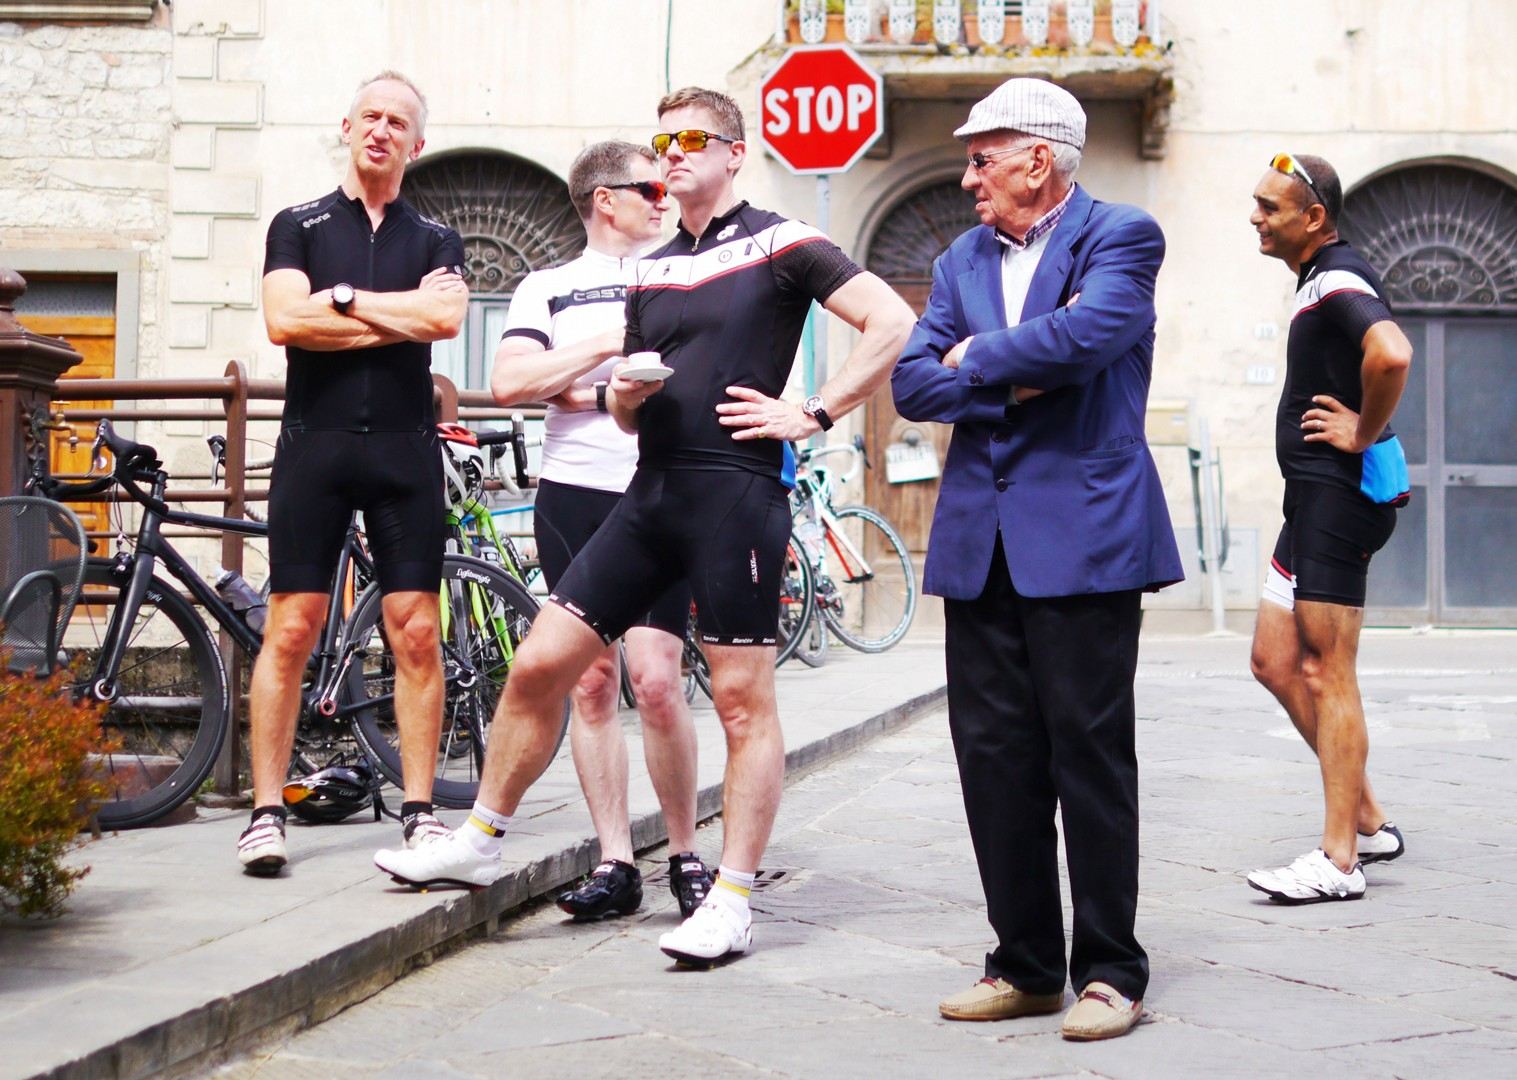 team-guided-cycling-holiday-tuscany-italy.jpg - Italy - Tuscany Tourer - Guided Road Cycling Holiday - Italia Road Cycling